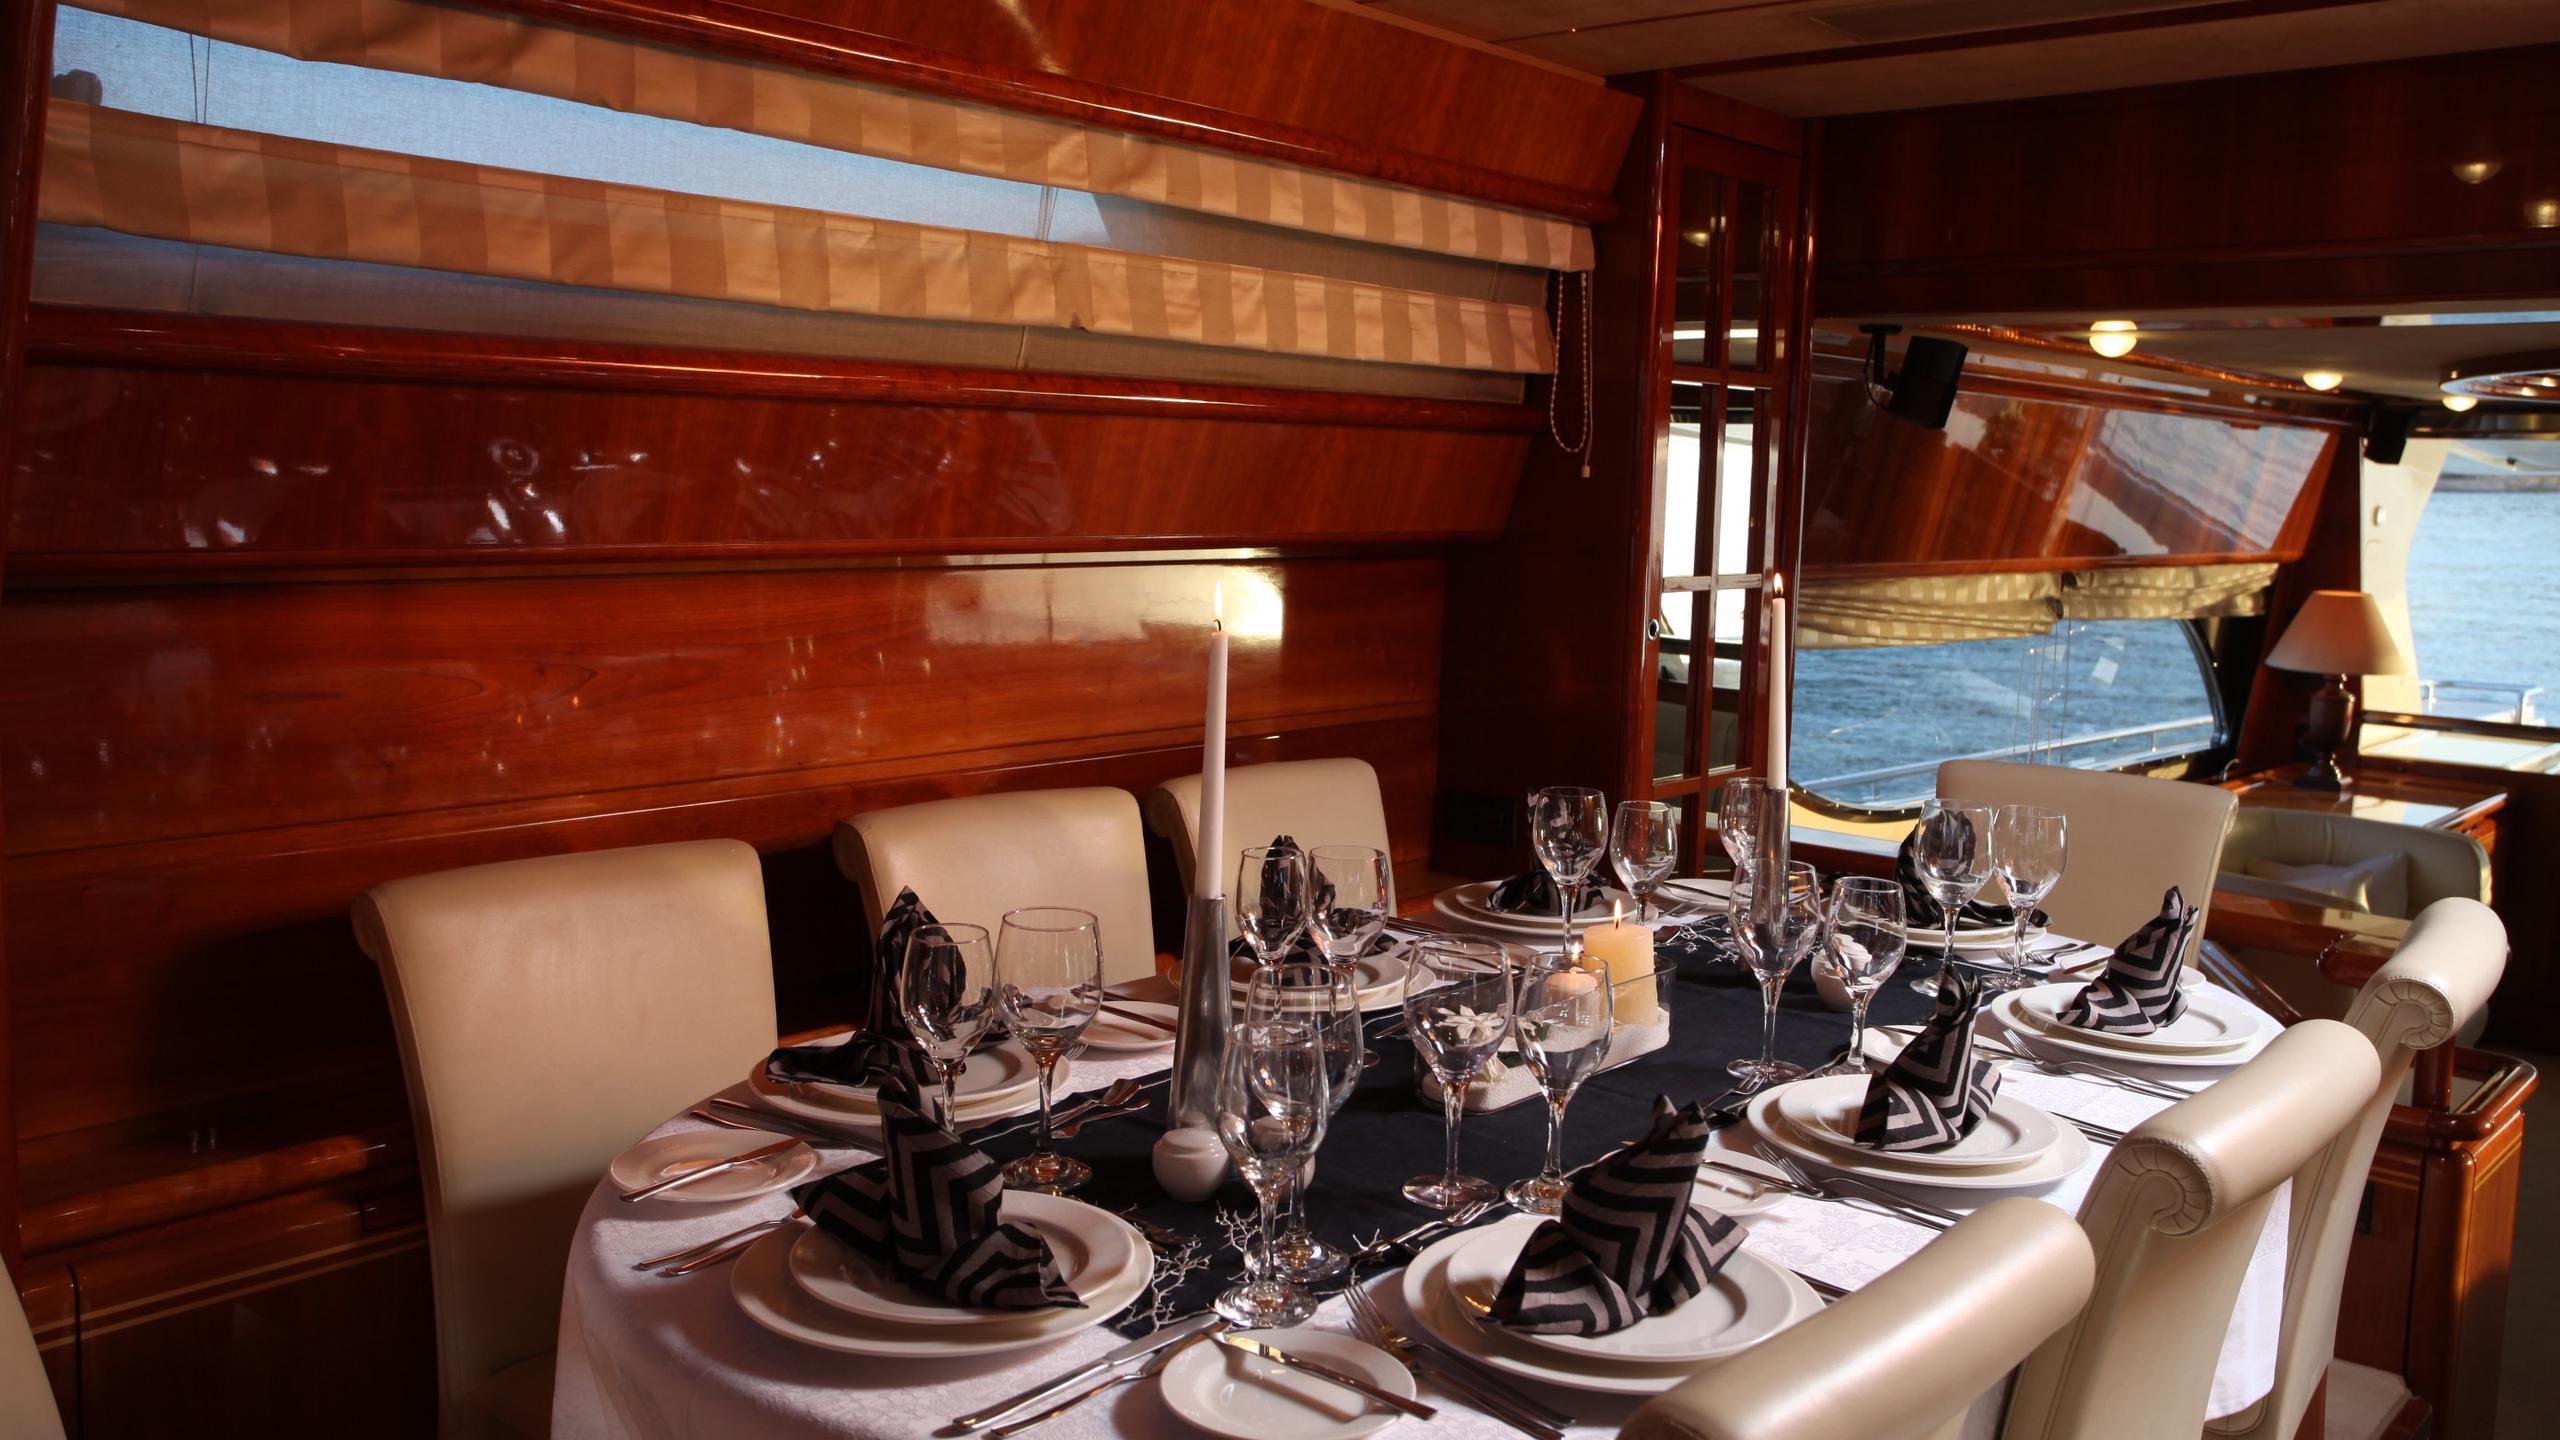 kentavros-ii-yacht-formal-dining